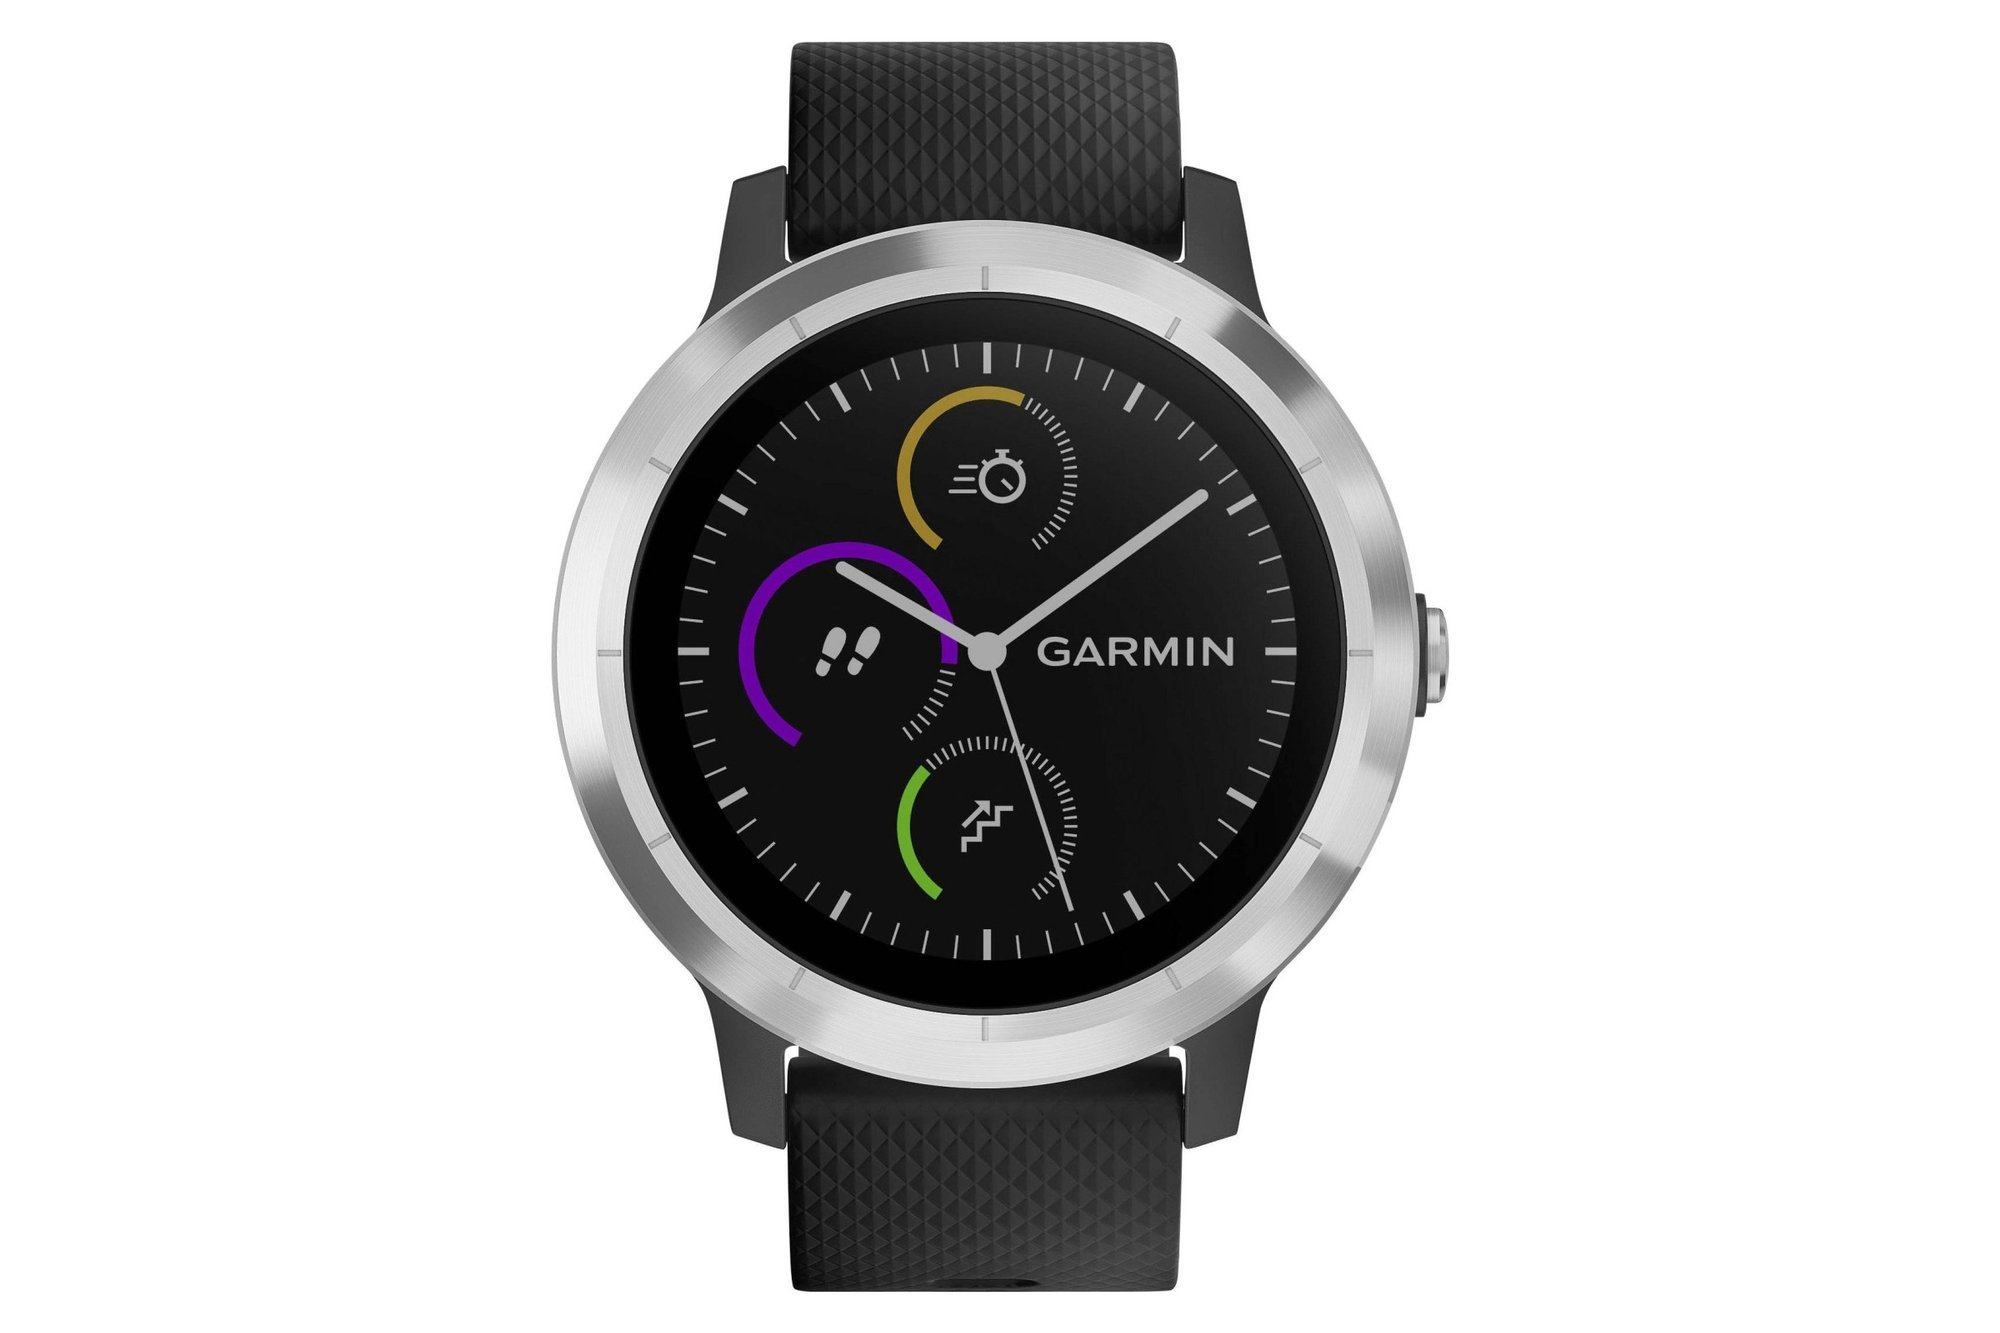 Smartwatch GPS Sport watch Garmin Vivoactive 3 Silver/Black